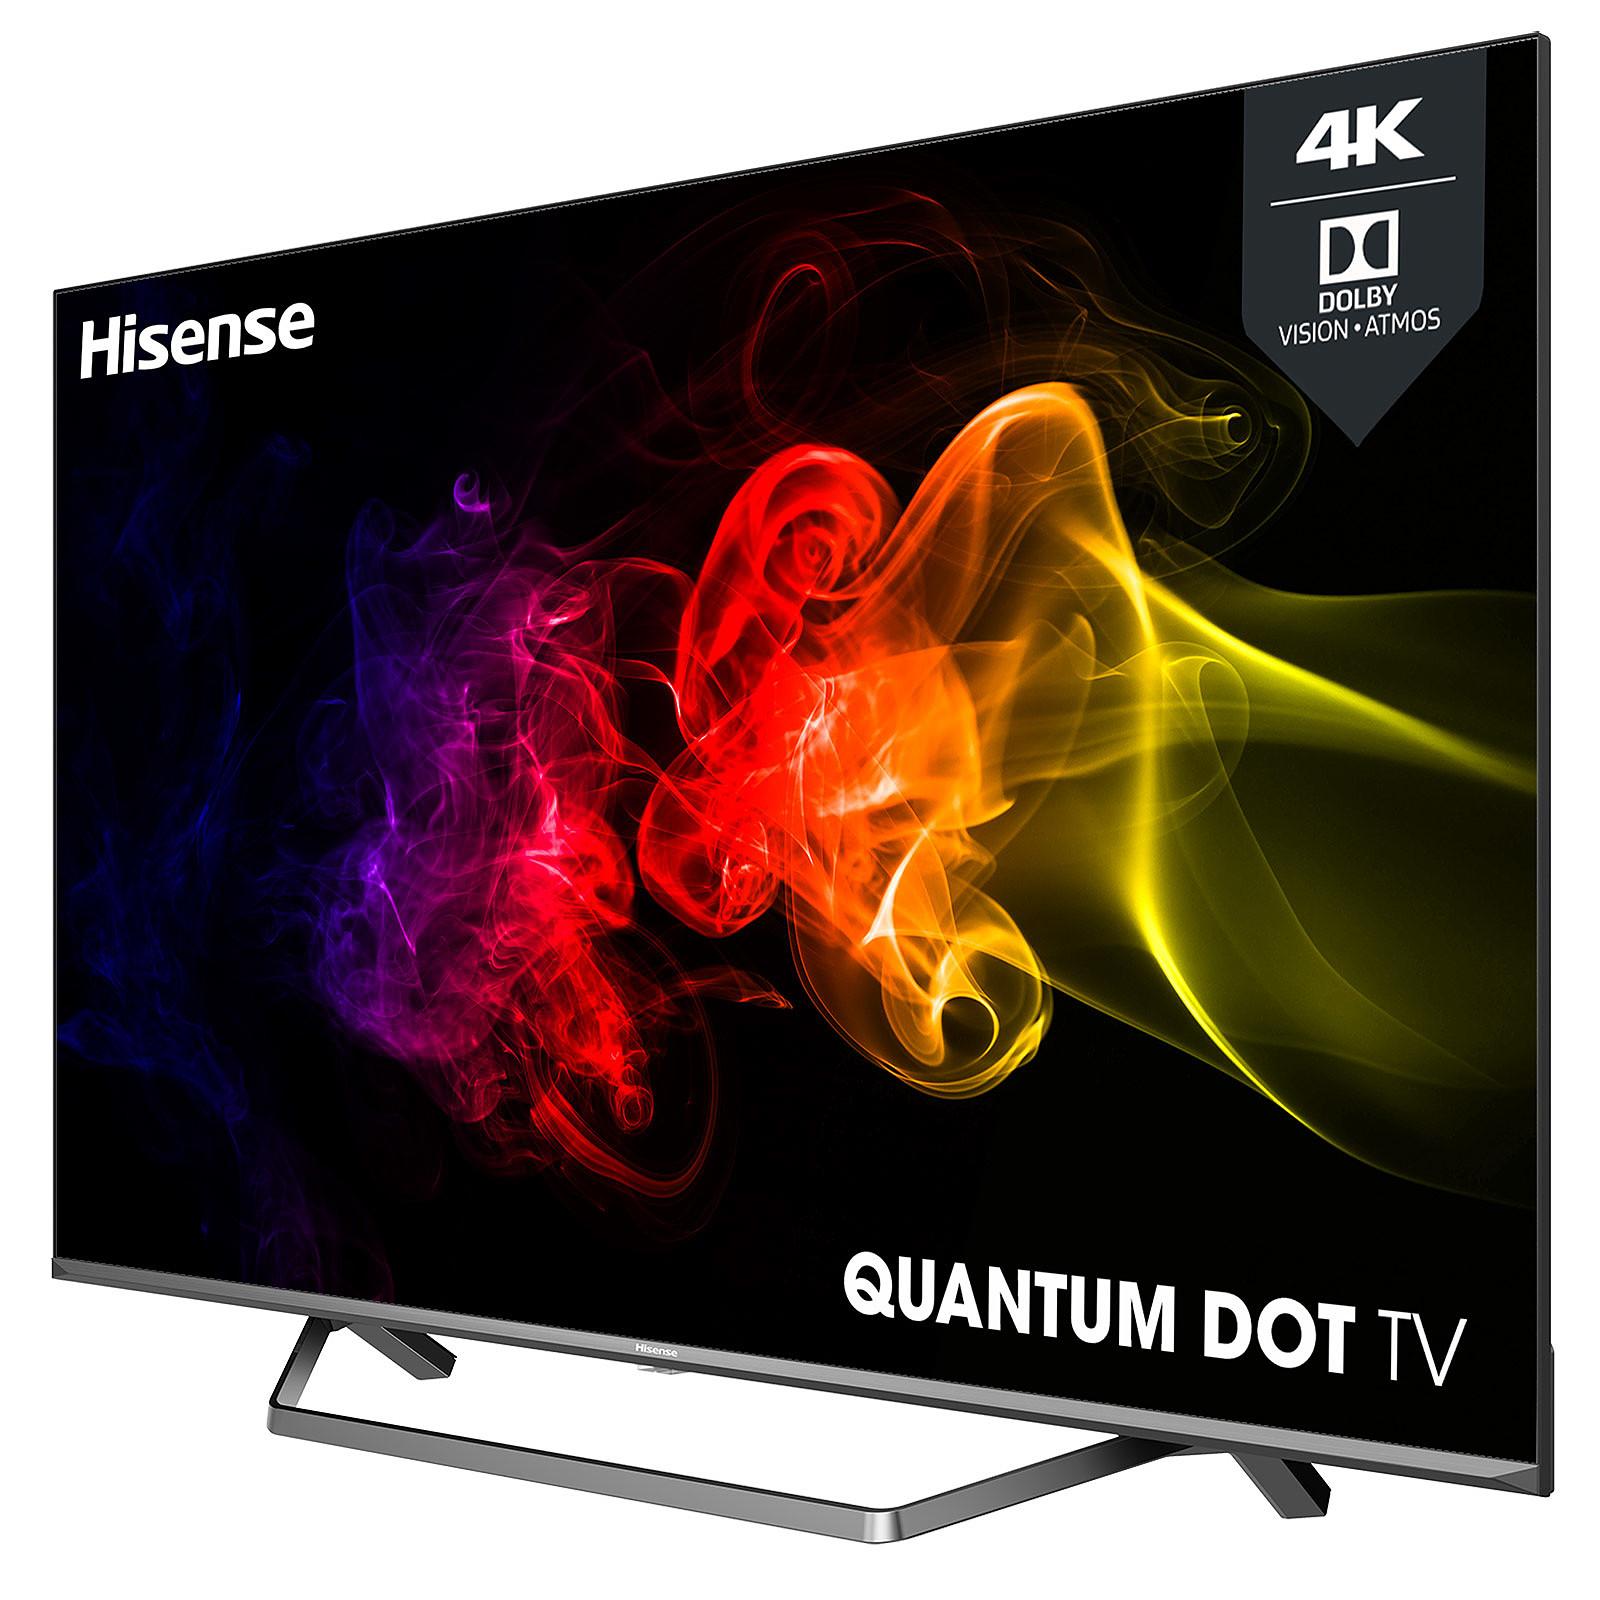 "TV 65"" Hisense 65U72QF - QLED, 4K, HDR 10+, Dolby Vision & Atmos, Smart TV (+ Jusqu'à 224.75€ en Rakuten Points) - Via ODR 200€ (Boulanger)"